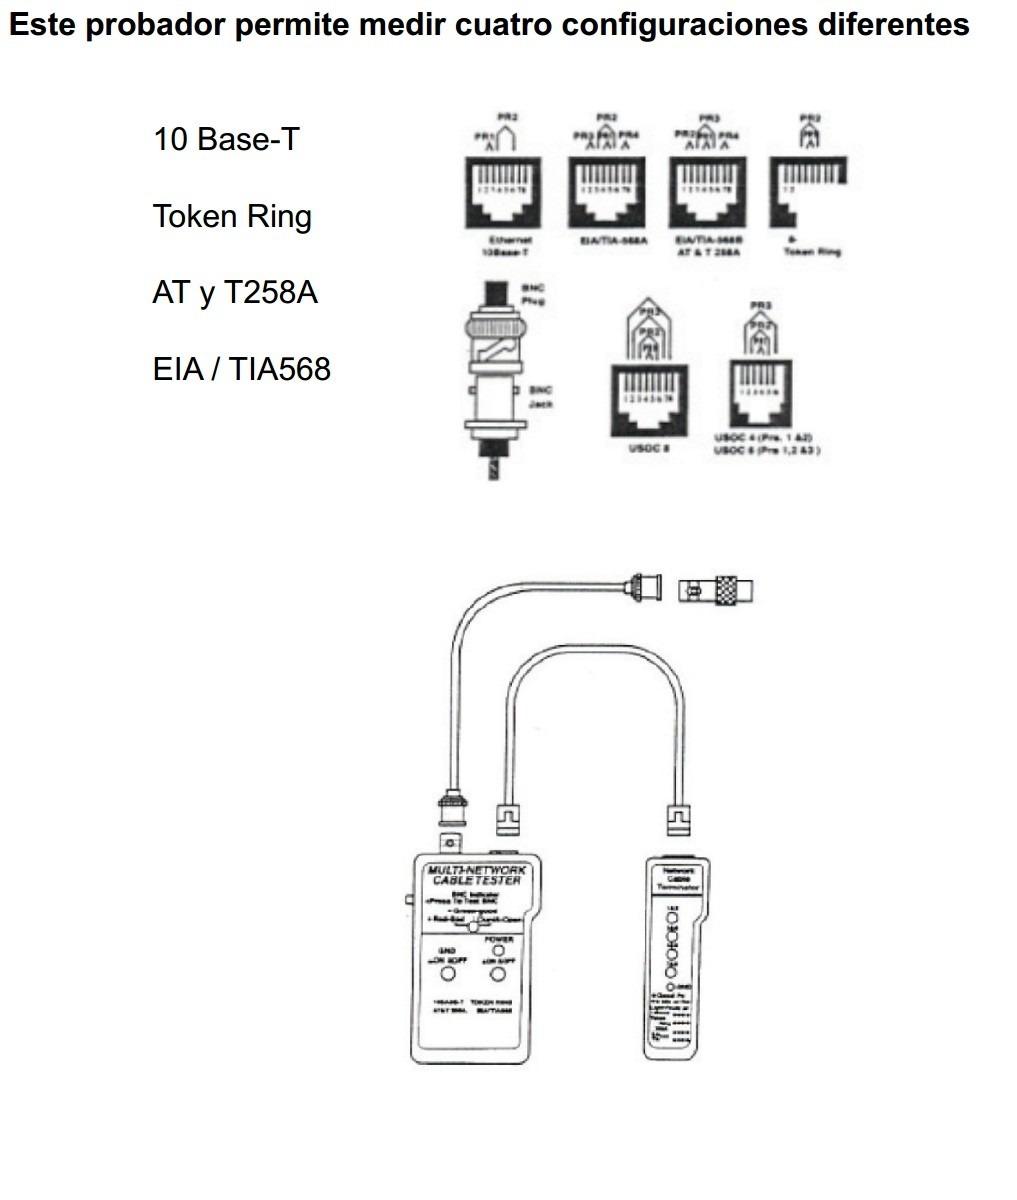 t568b db9 wiring diagram 568b wiring diagram elsavadorla